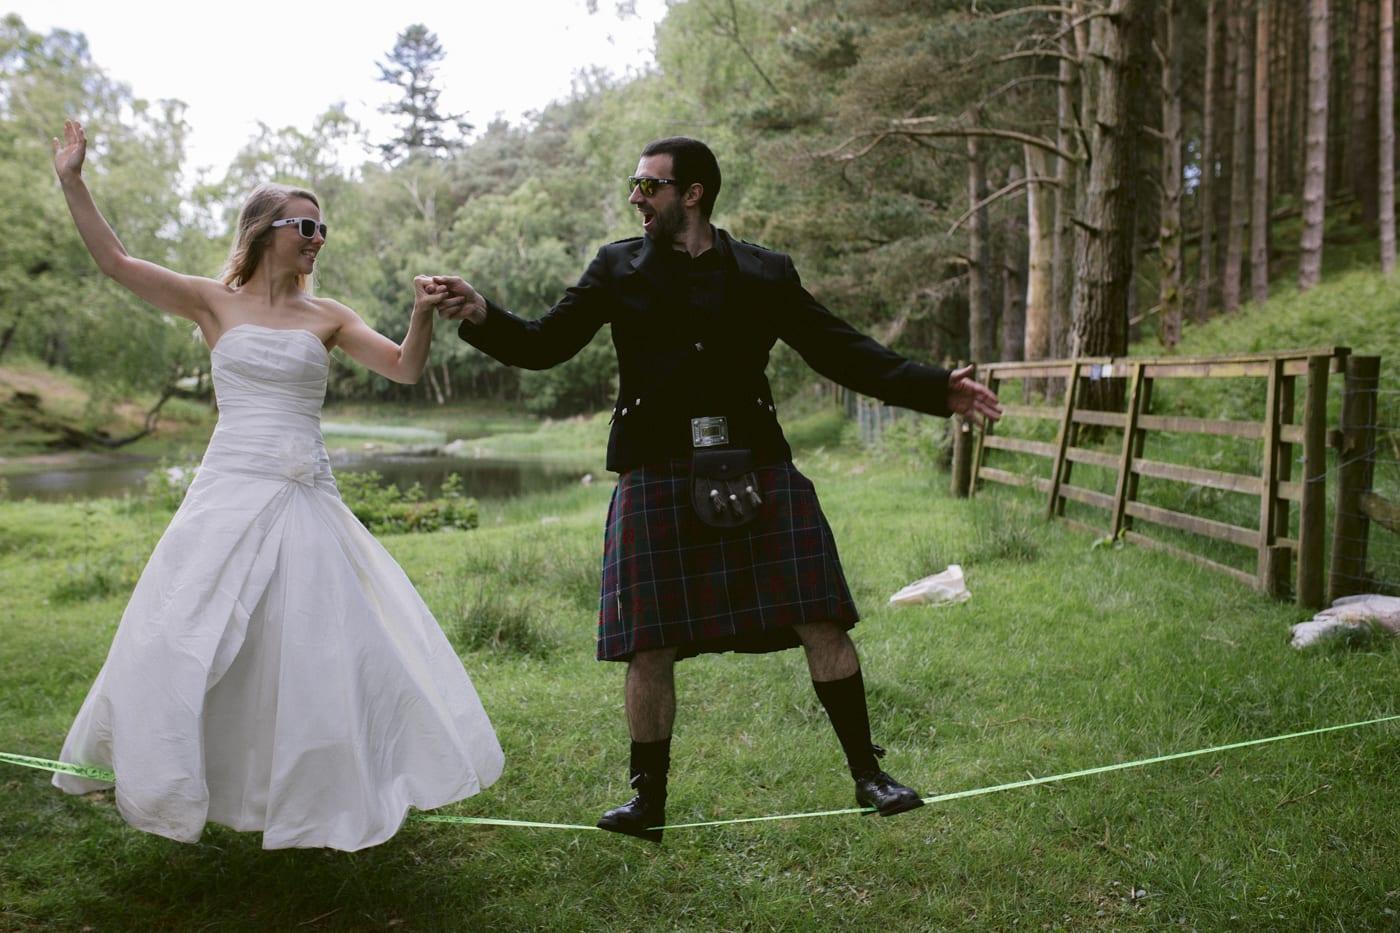 Hand in Hand Bride and Groom Rope Walking in Field Portrait Shot